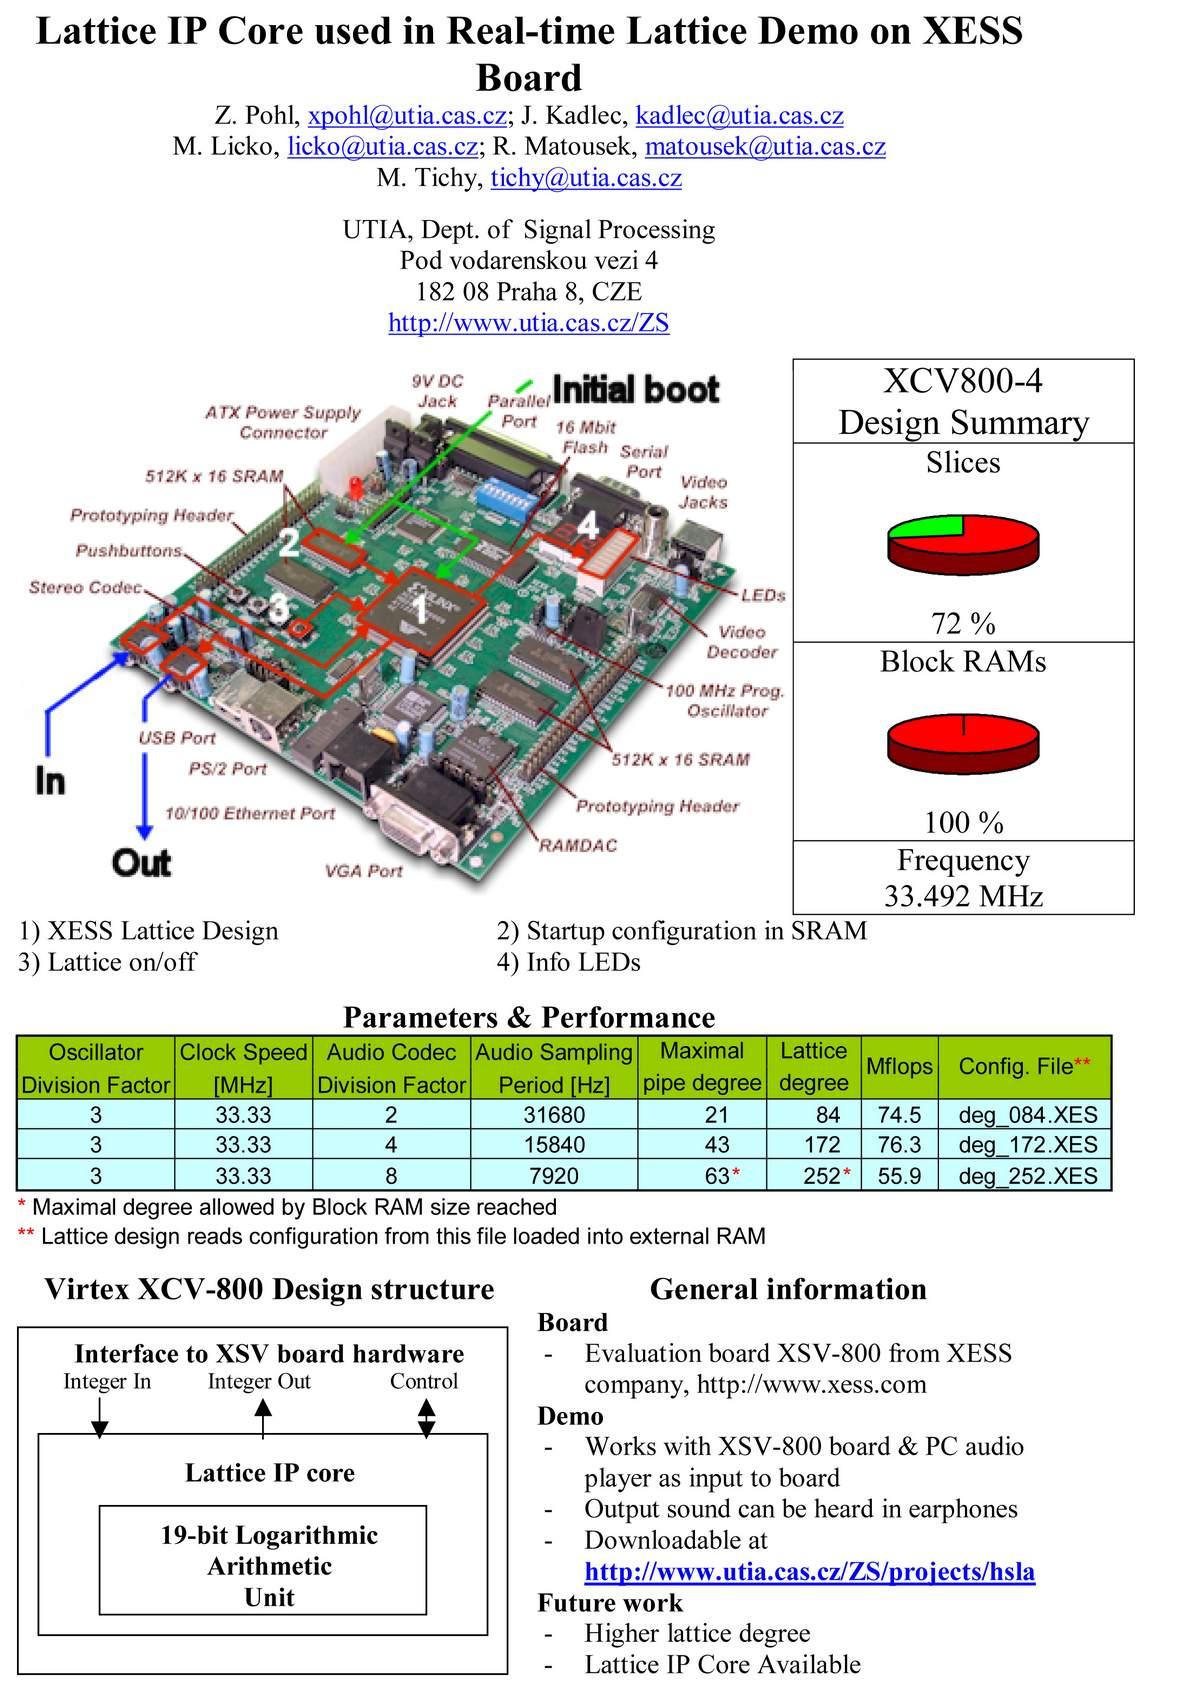 Signal Processing Utia Presentations Logic Diagram Of Alu Rls Lattice Macros For Virtex E Virtex2 With Lns 19 32 Bit